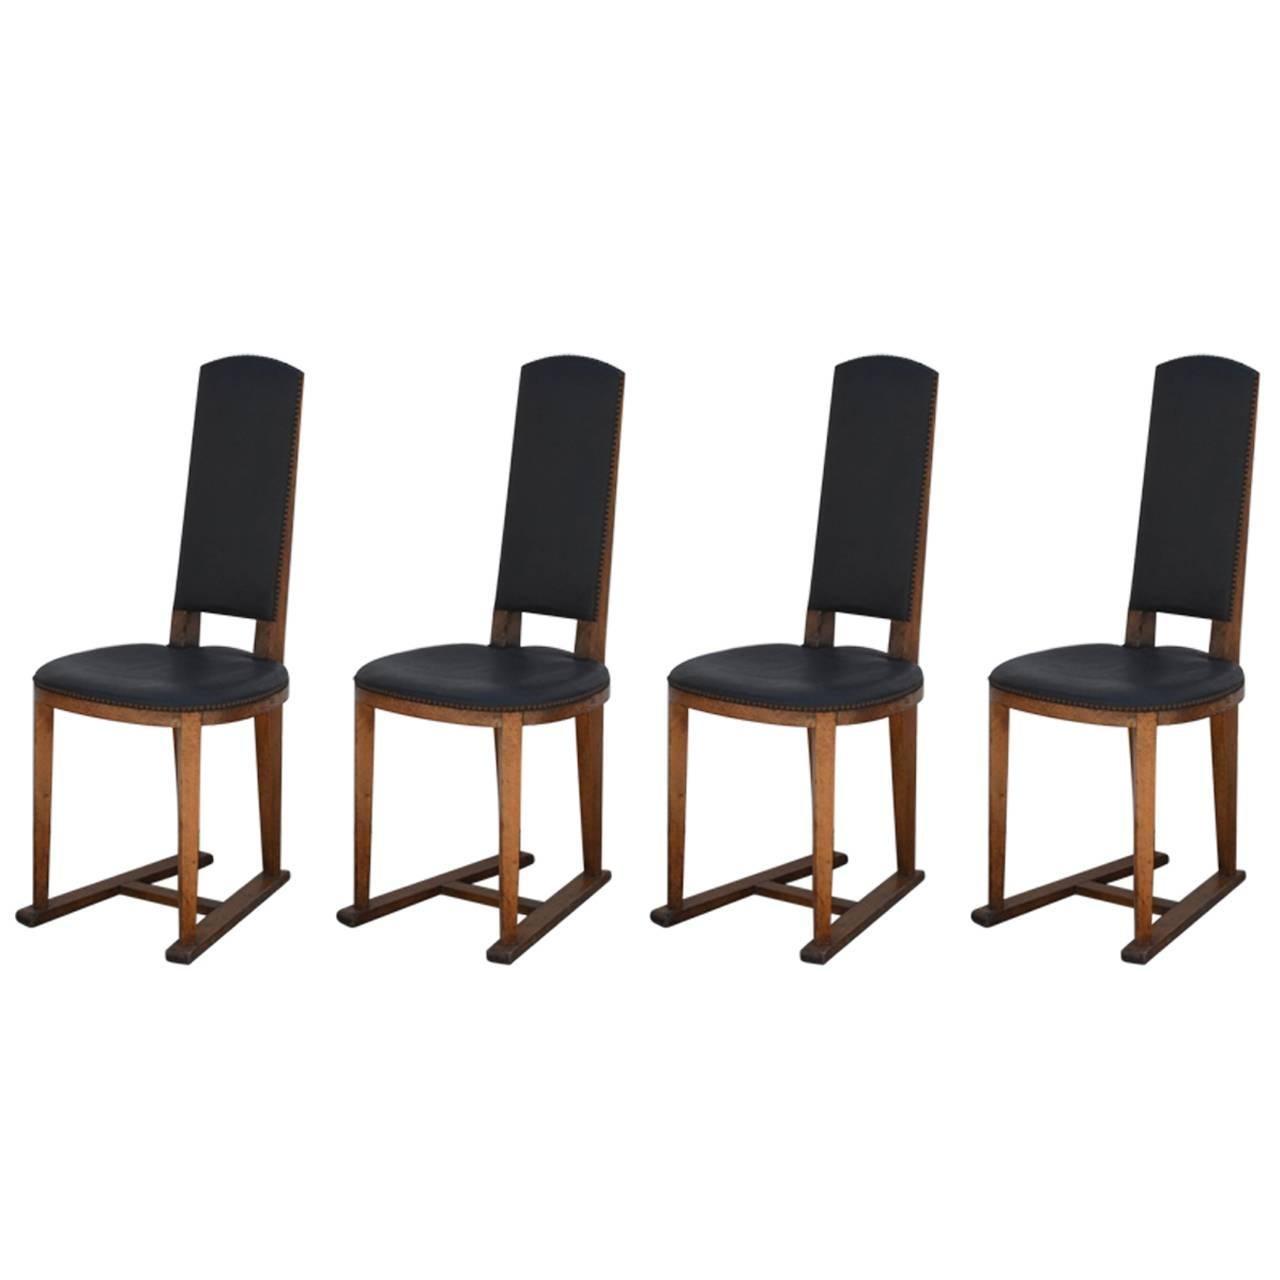 Set of Four Slender Oak Arts & Crafts Sledge Chairs